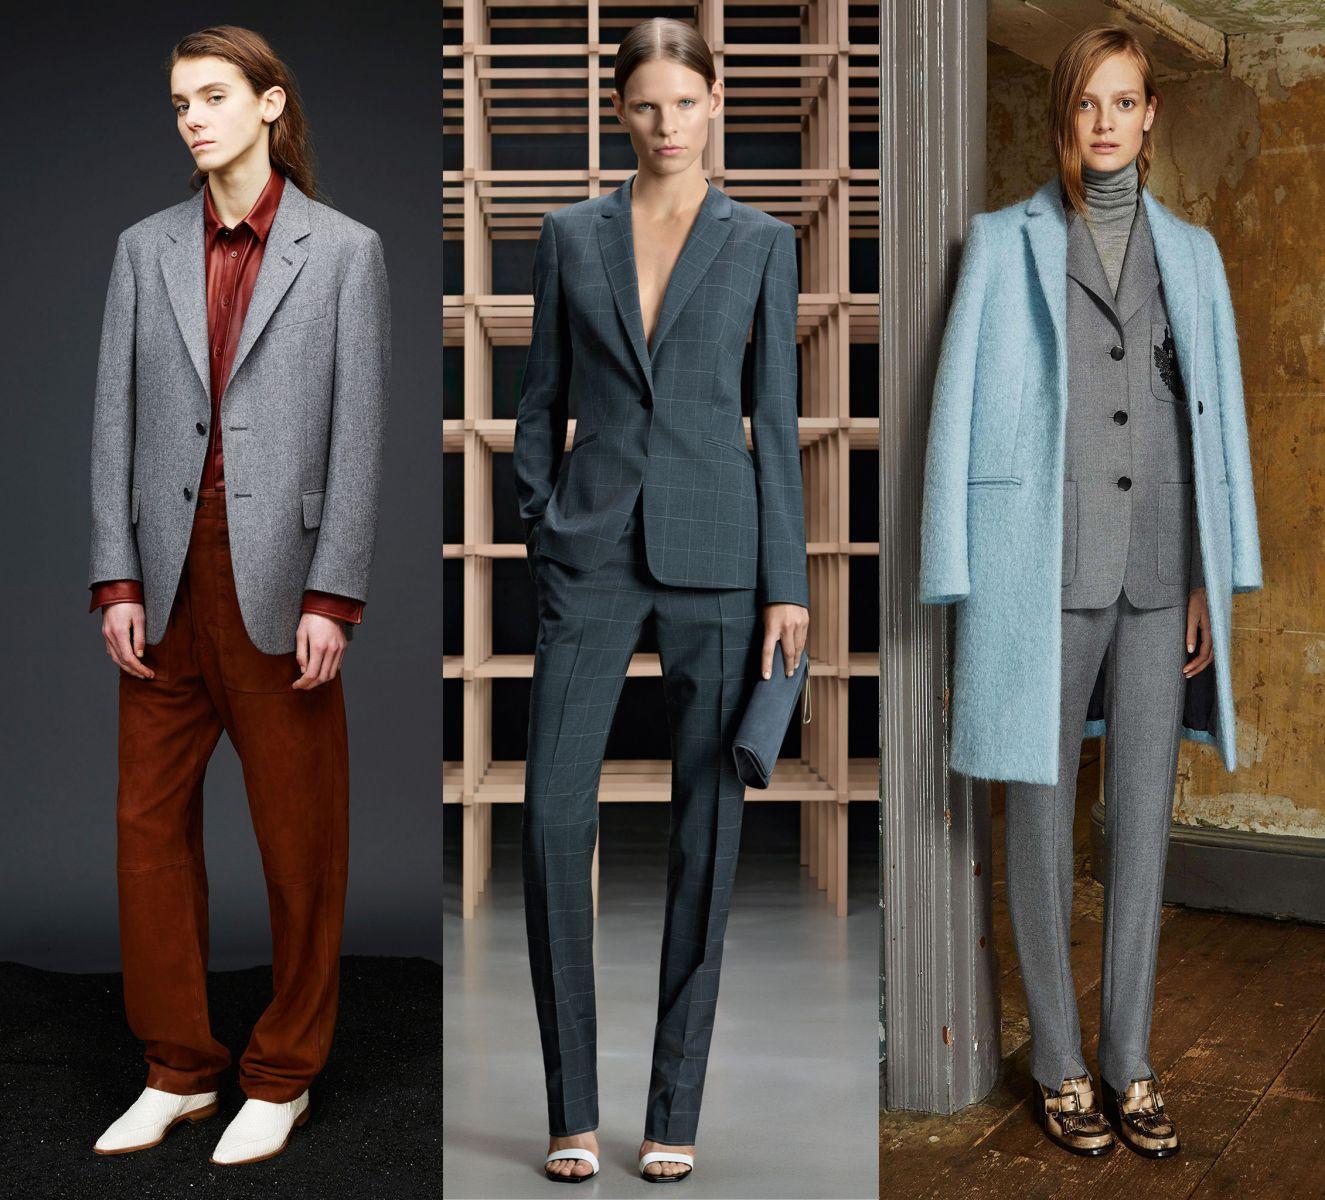 Что носить в 2015 году: тенденции pre-fall - фото №1